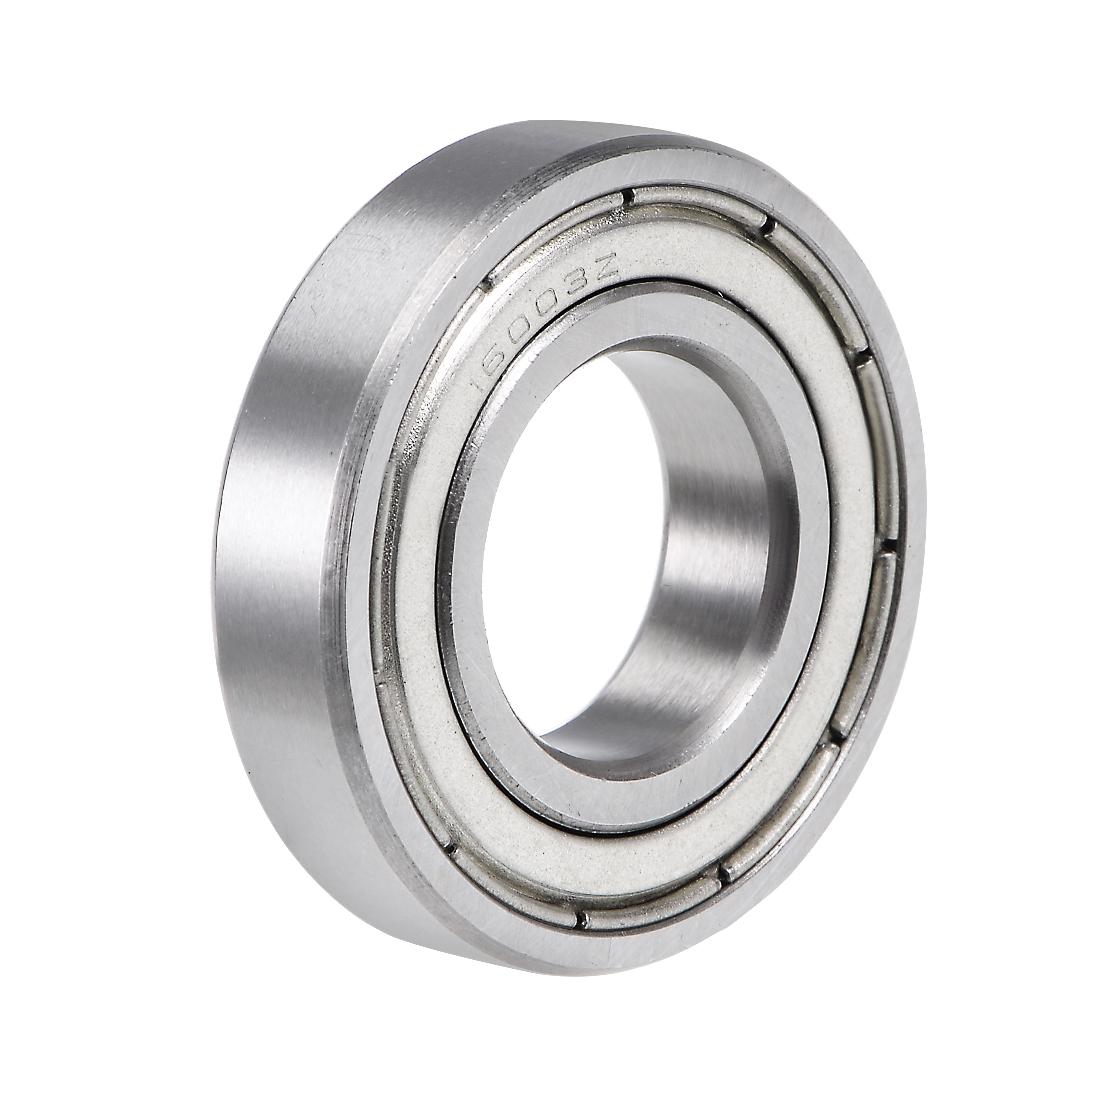 16003ZZ Deep Groove Ball Bearing 17x35x8mm Double Shielded Chrome Steel Bearings